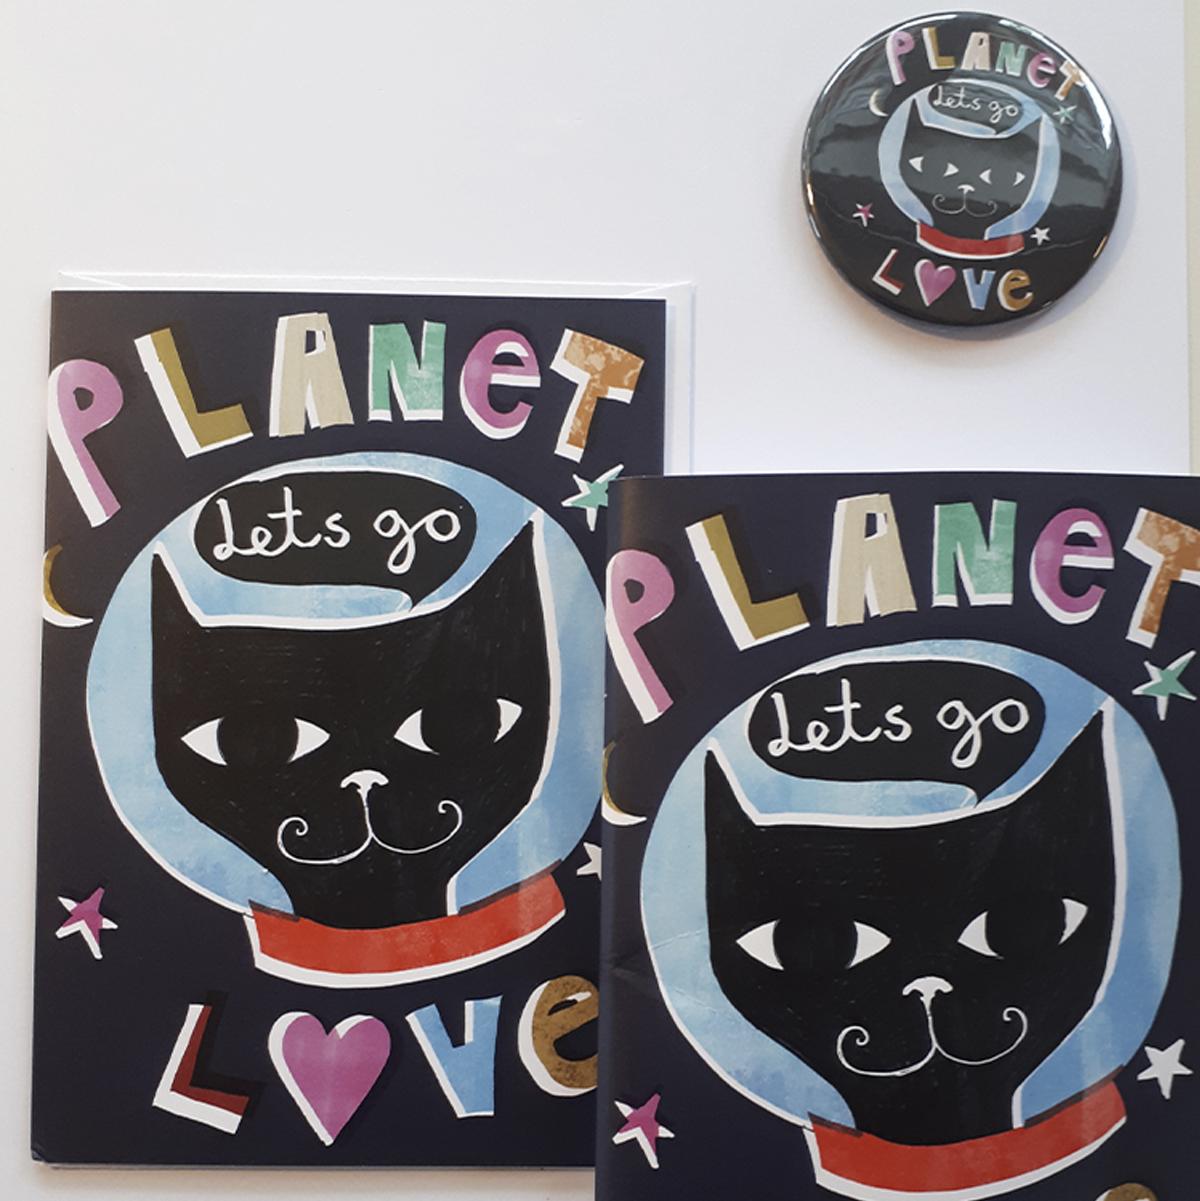 Packs valentines day-Planet Love Susse.jpg